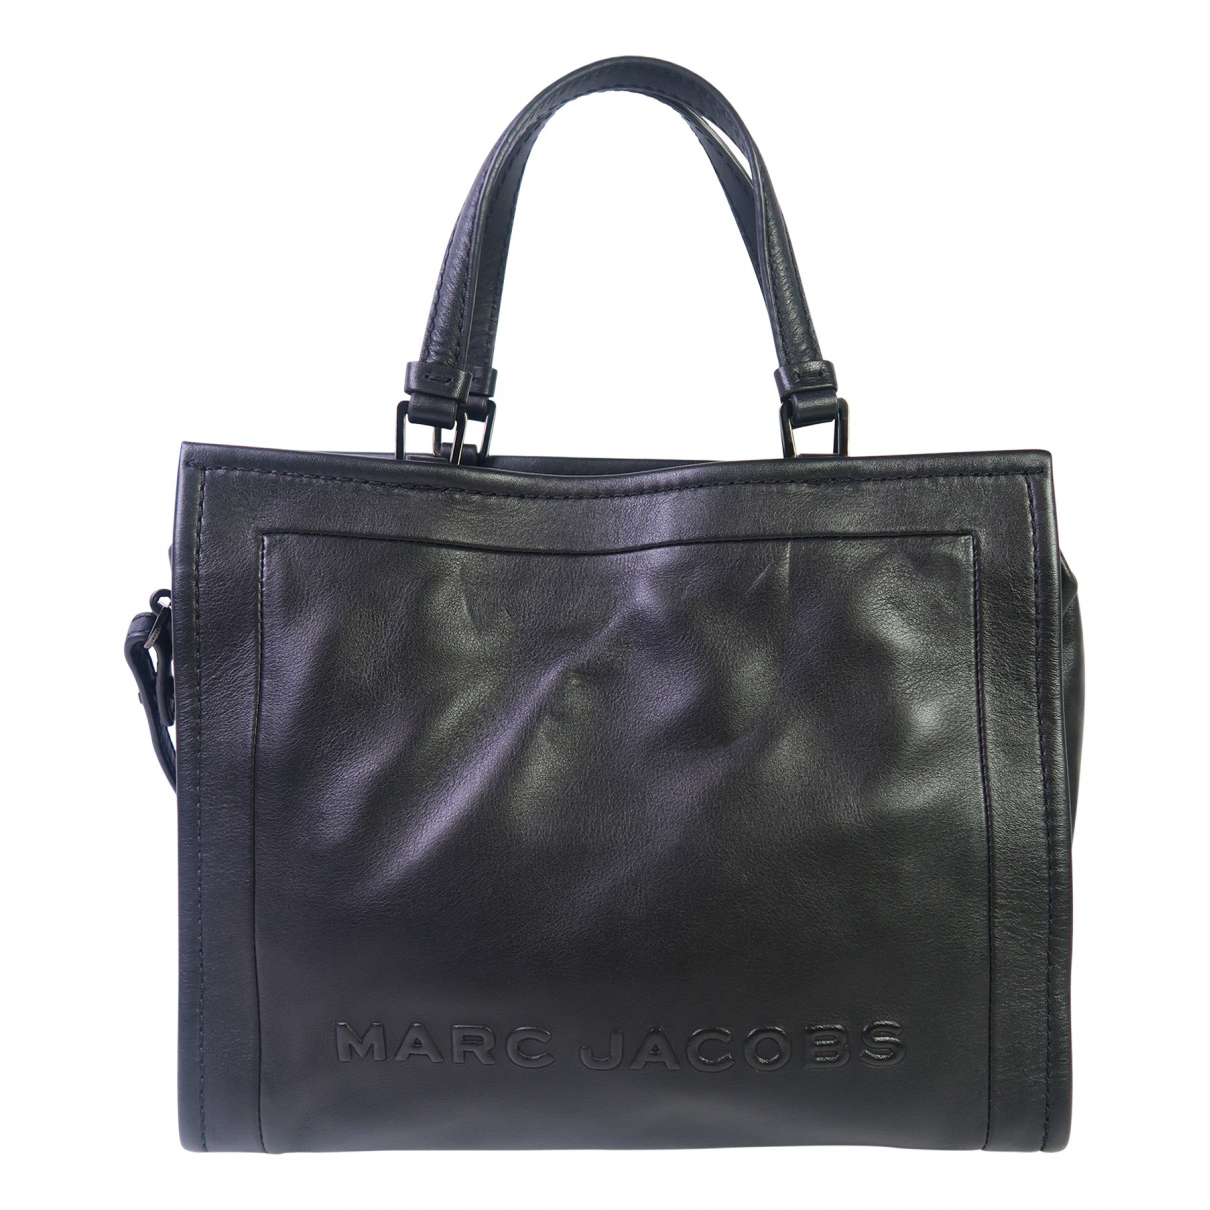 Marc Jacobs N Black Leather handbag for Women N